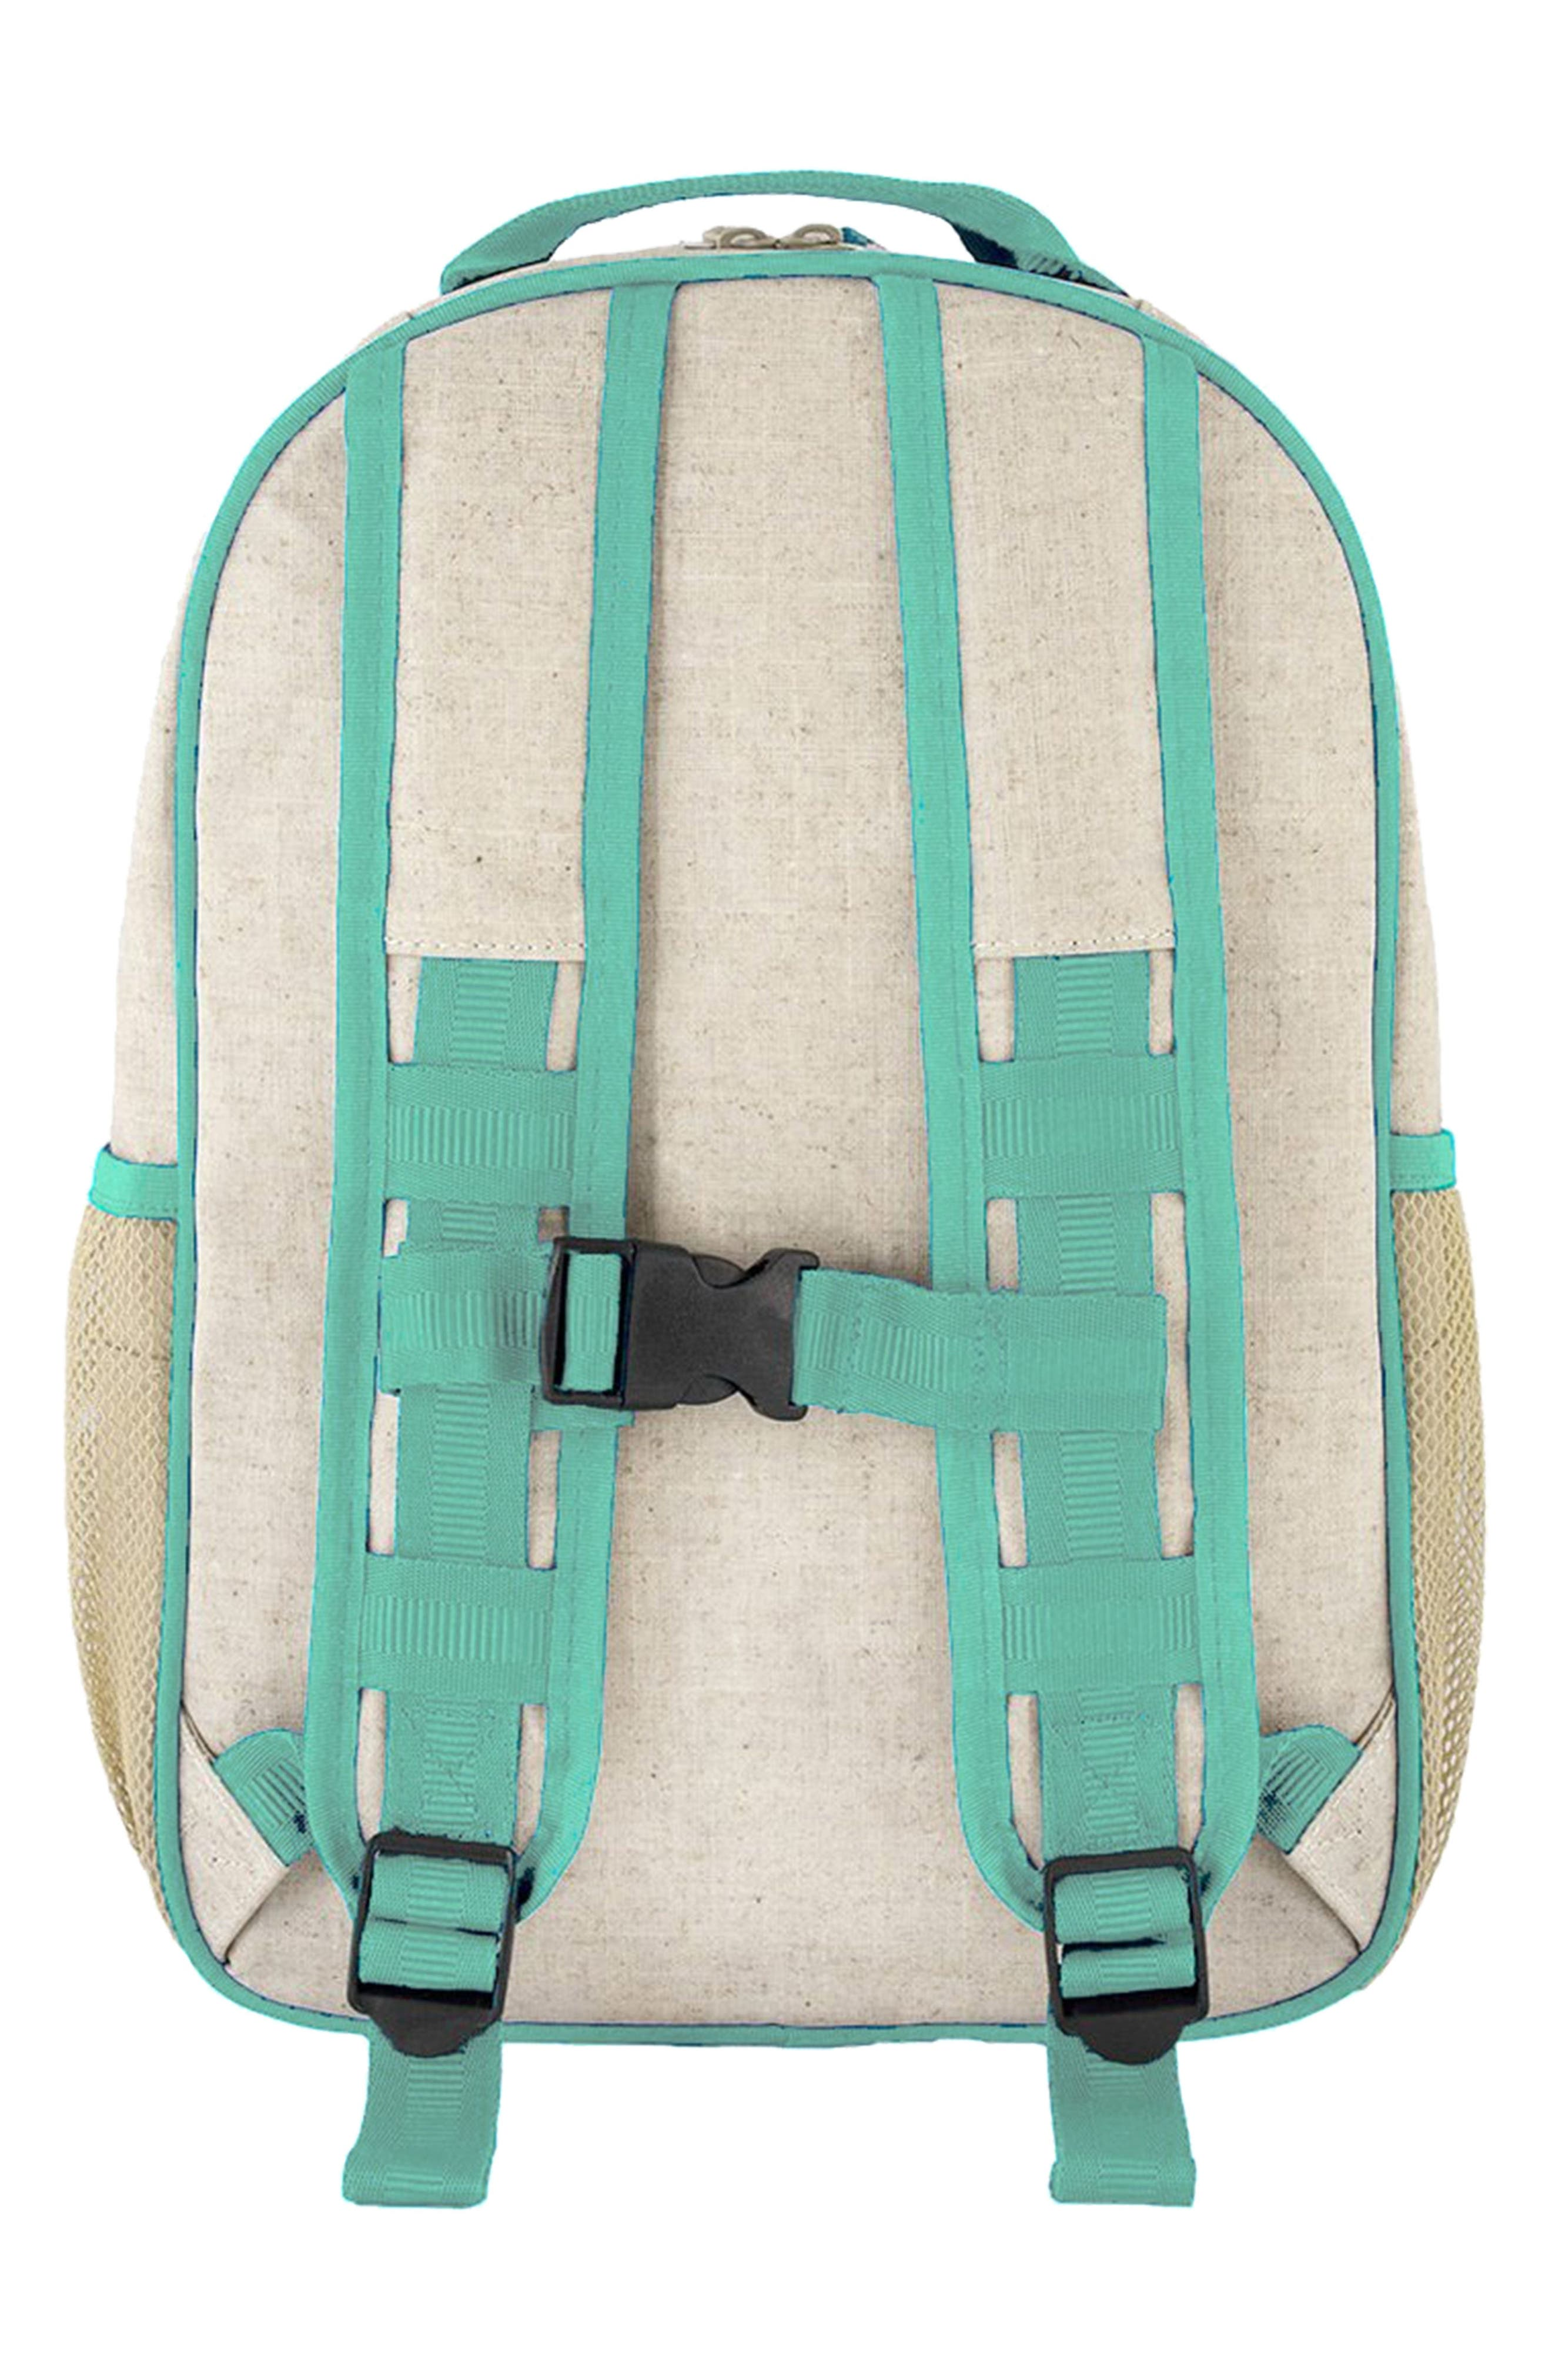 Raw Linen Toddler Backpack,                             Alternate thumbnail 4, color,